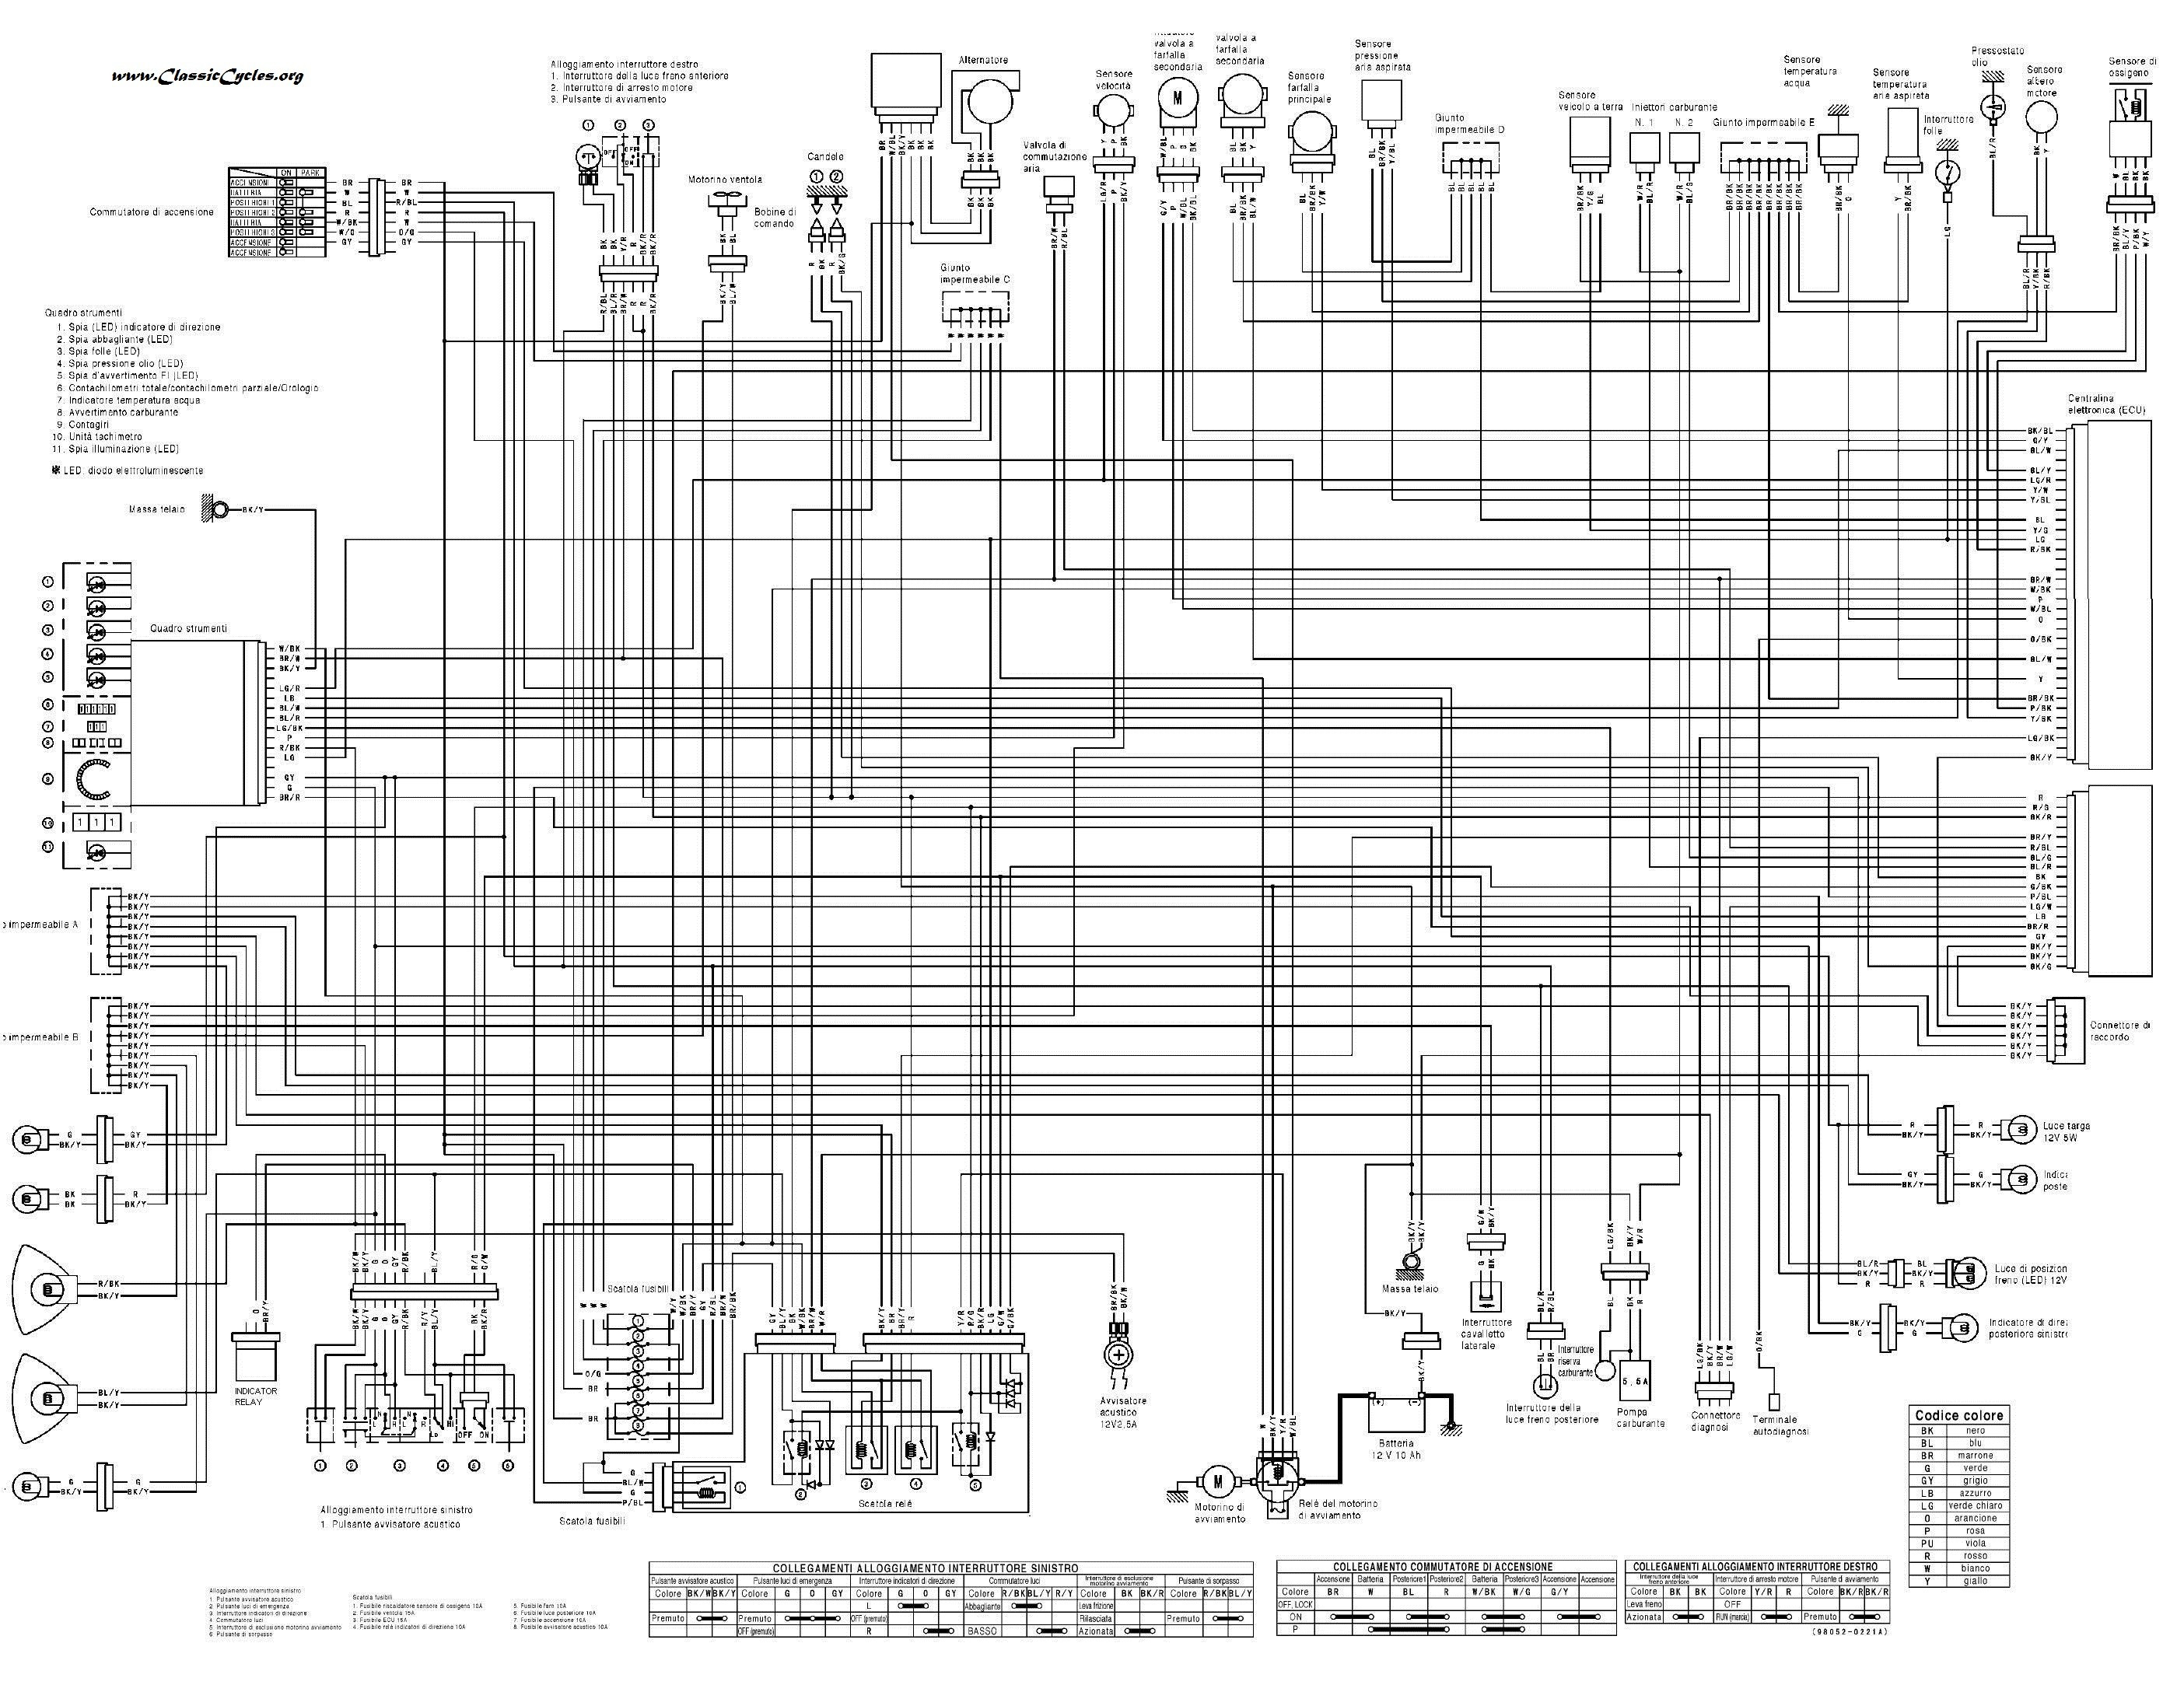 2003 Dodge Ram 1500 Engine Diagram 2014 Cummins 6 7 Transmission 95 Neon Durango Emissions Free Download Wiring Of